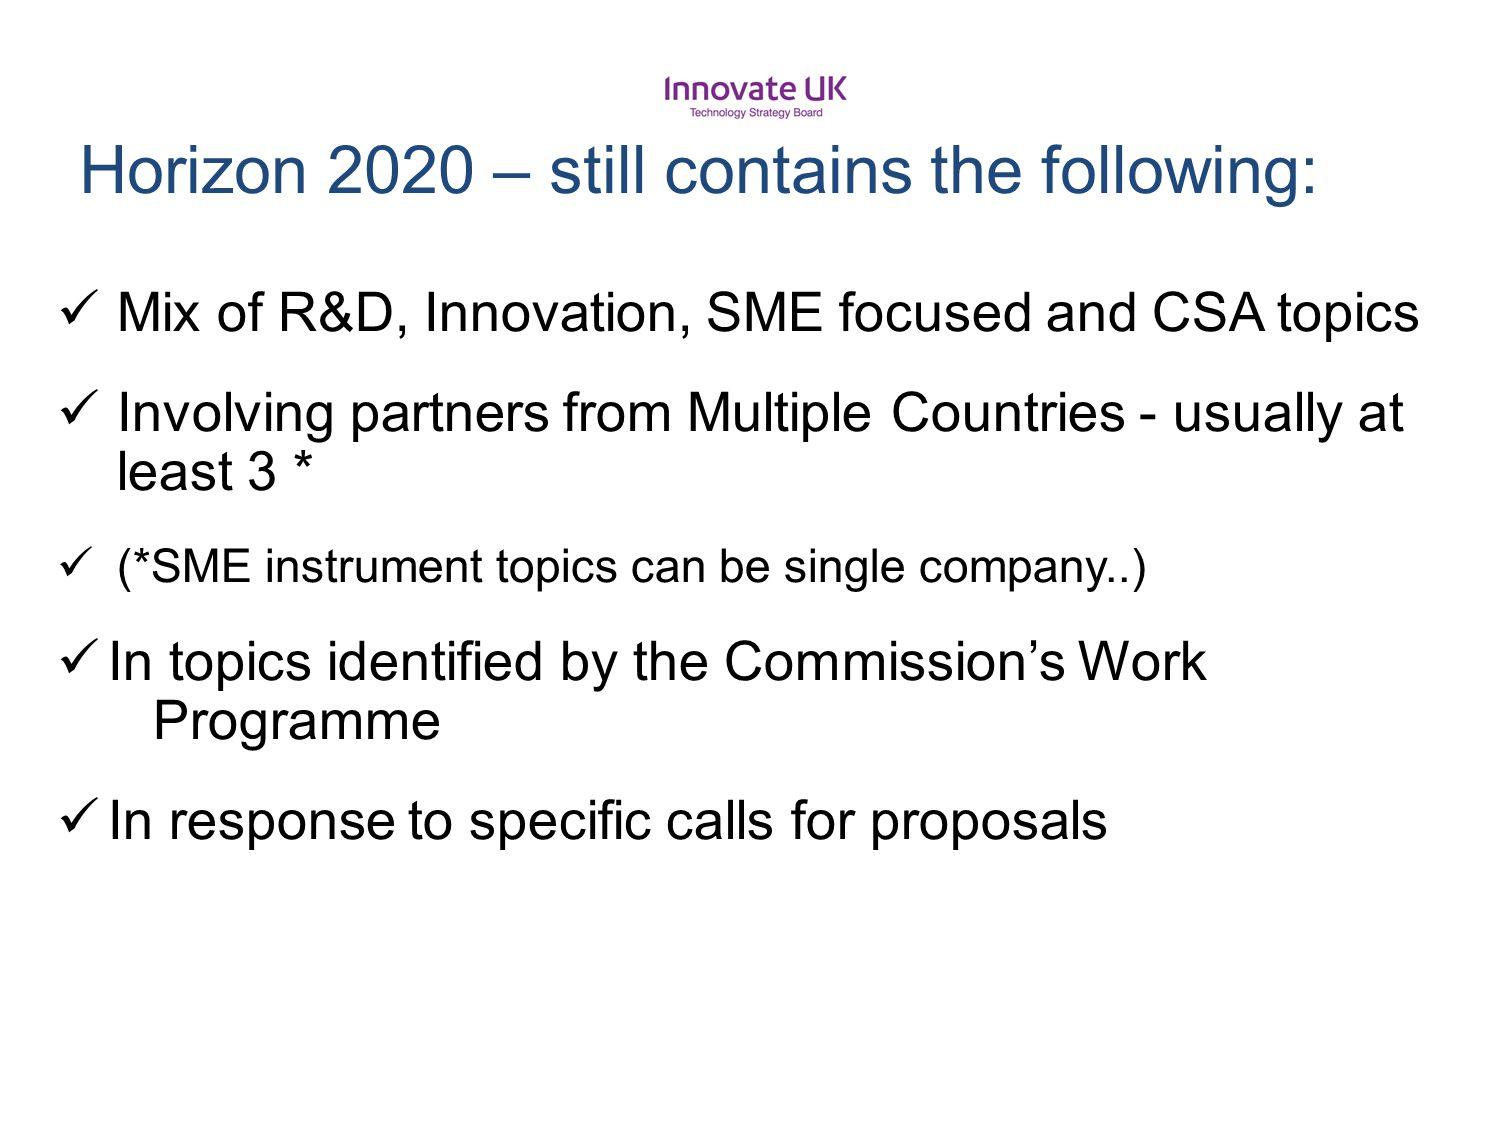 Horizon 2020 – still contains the following: